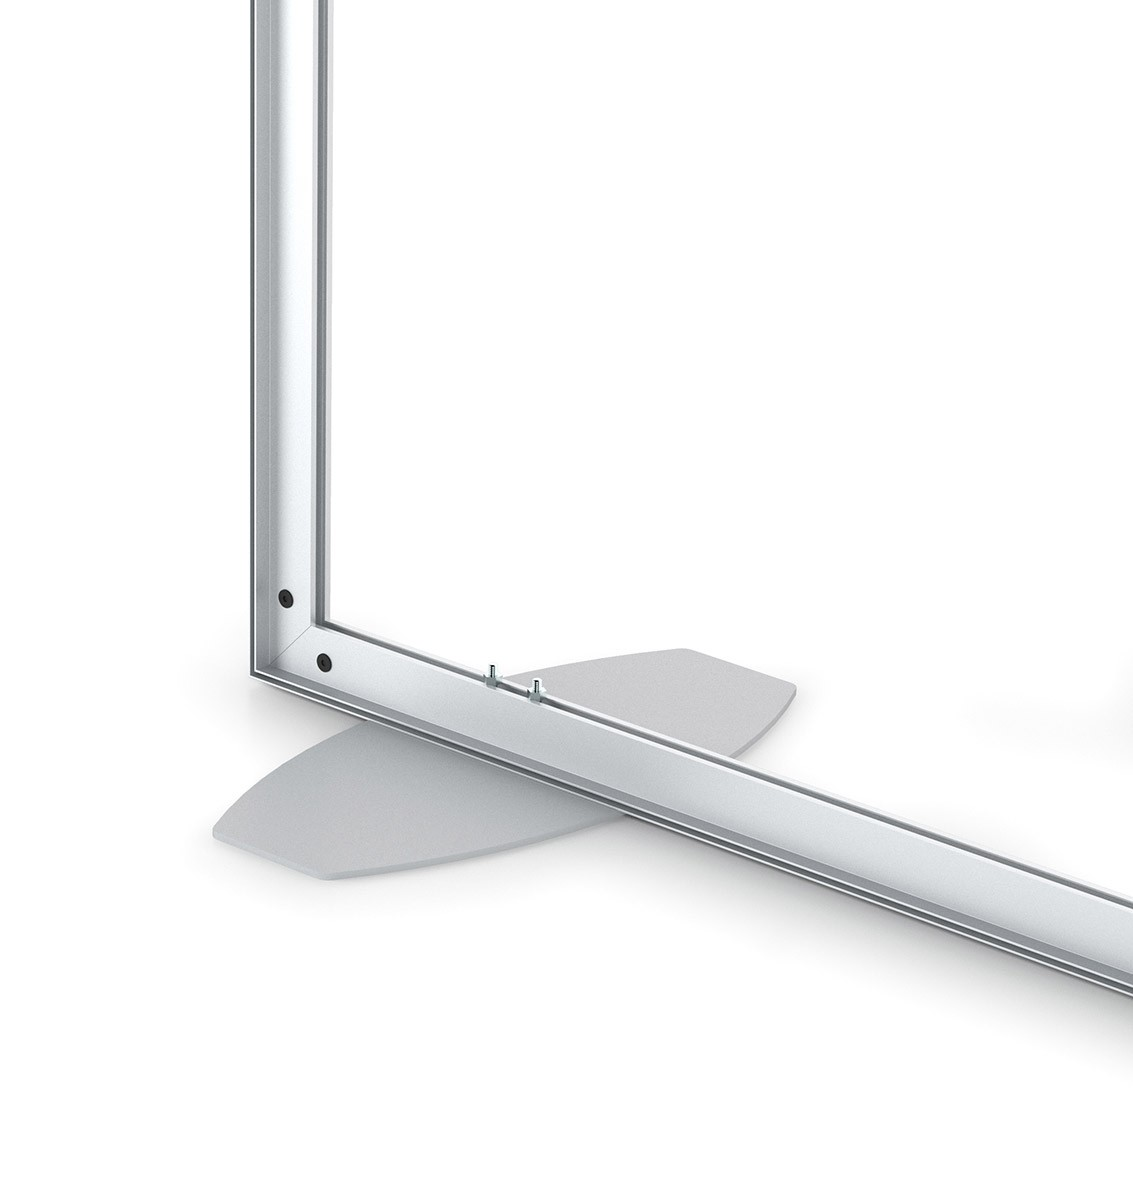 Charisma 72x120 Single Sided SEG Fabric Frame